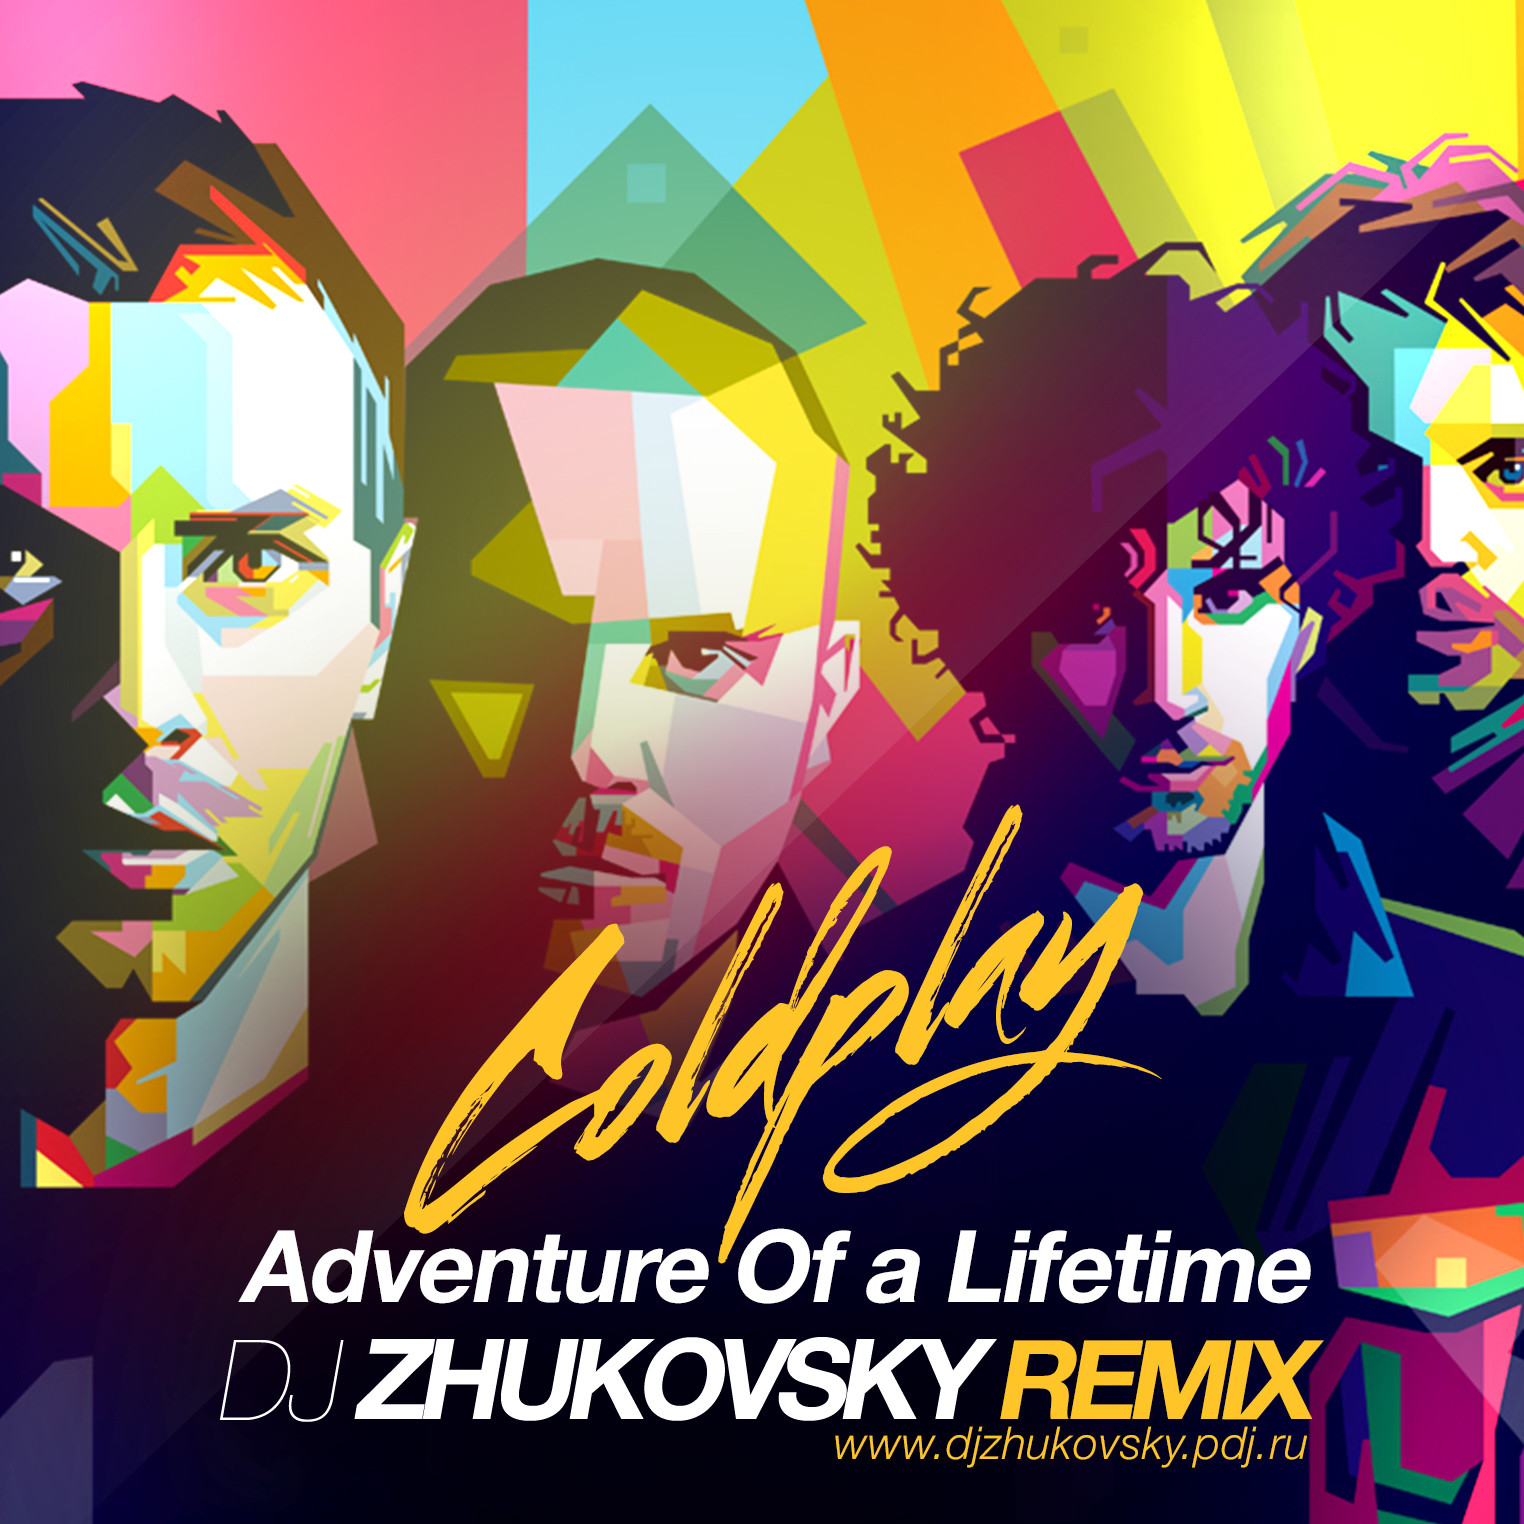 Taki Taki Rumba Mp3 Full Song Download: Adventure Of A Lifetime (Dj Zhukovsky Remix